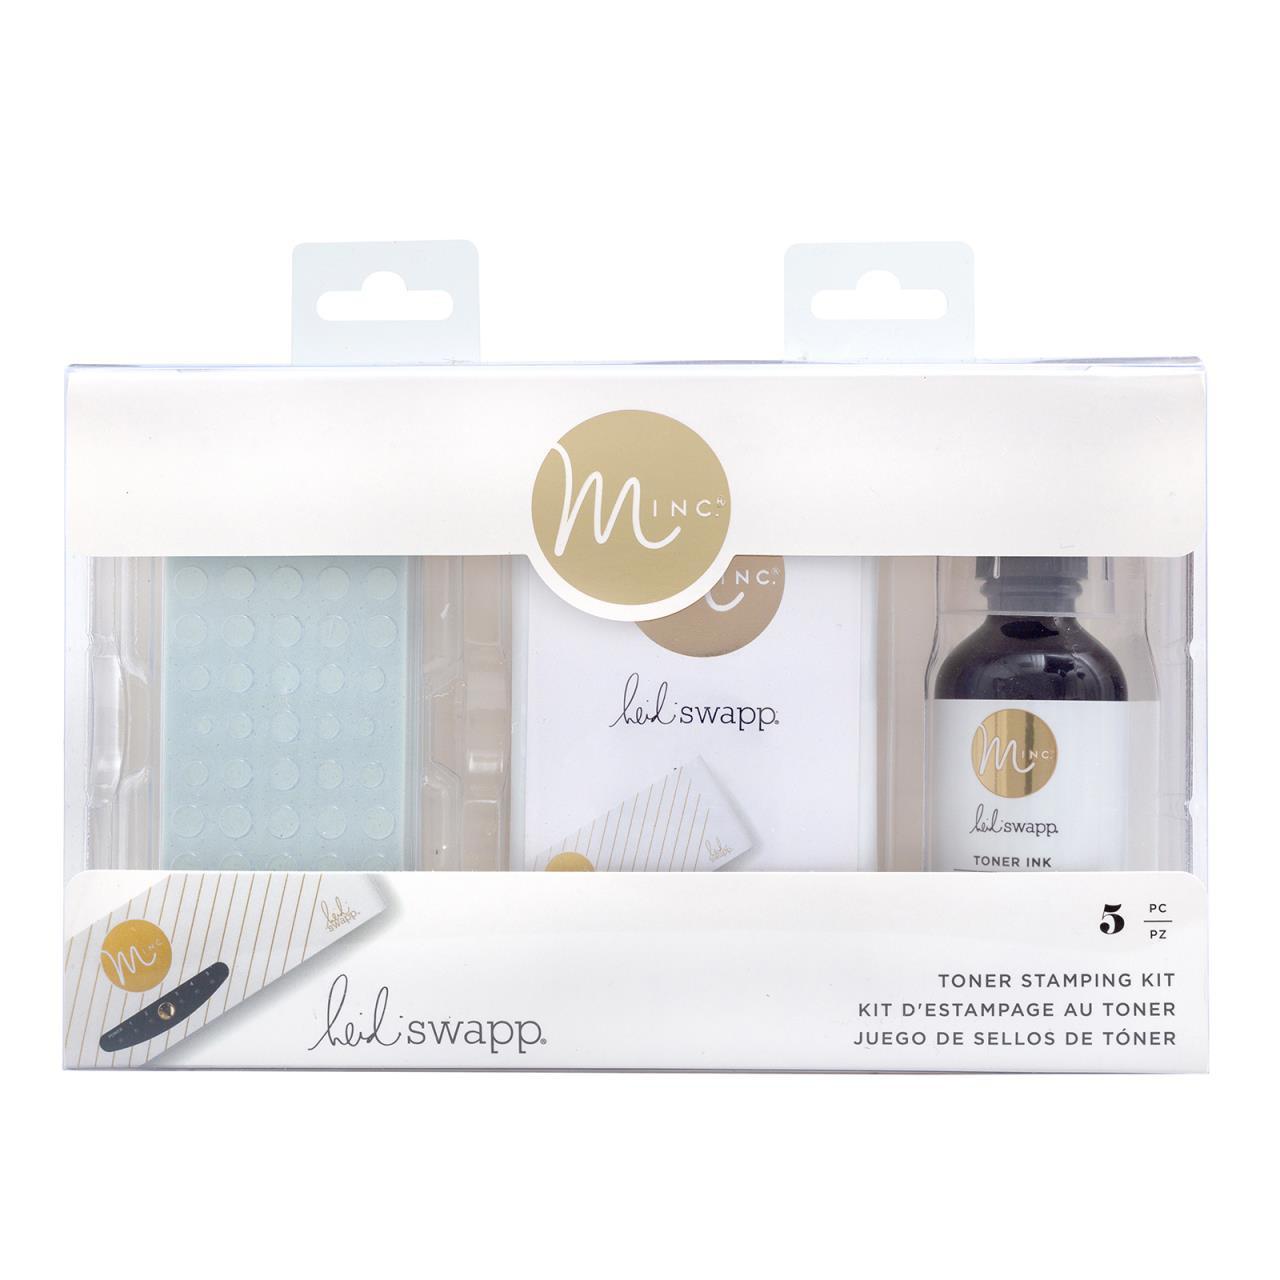 Minc Toner Stamping Kit, Heidi Swapp - 718813152860